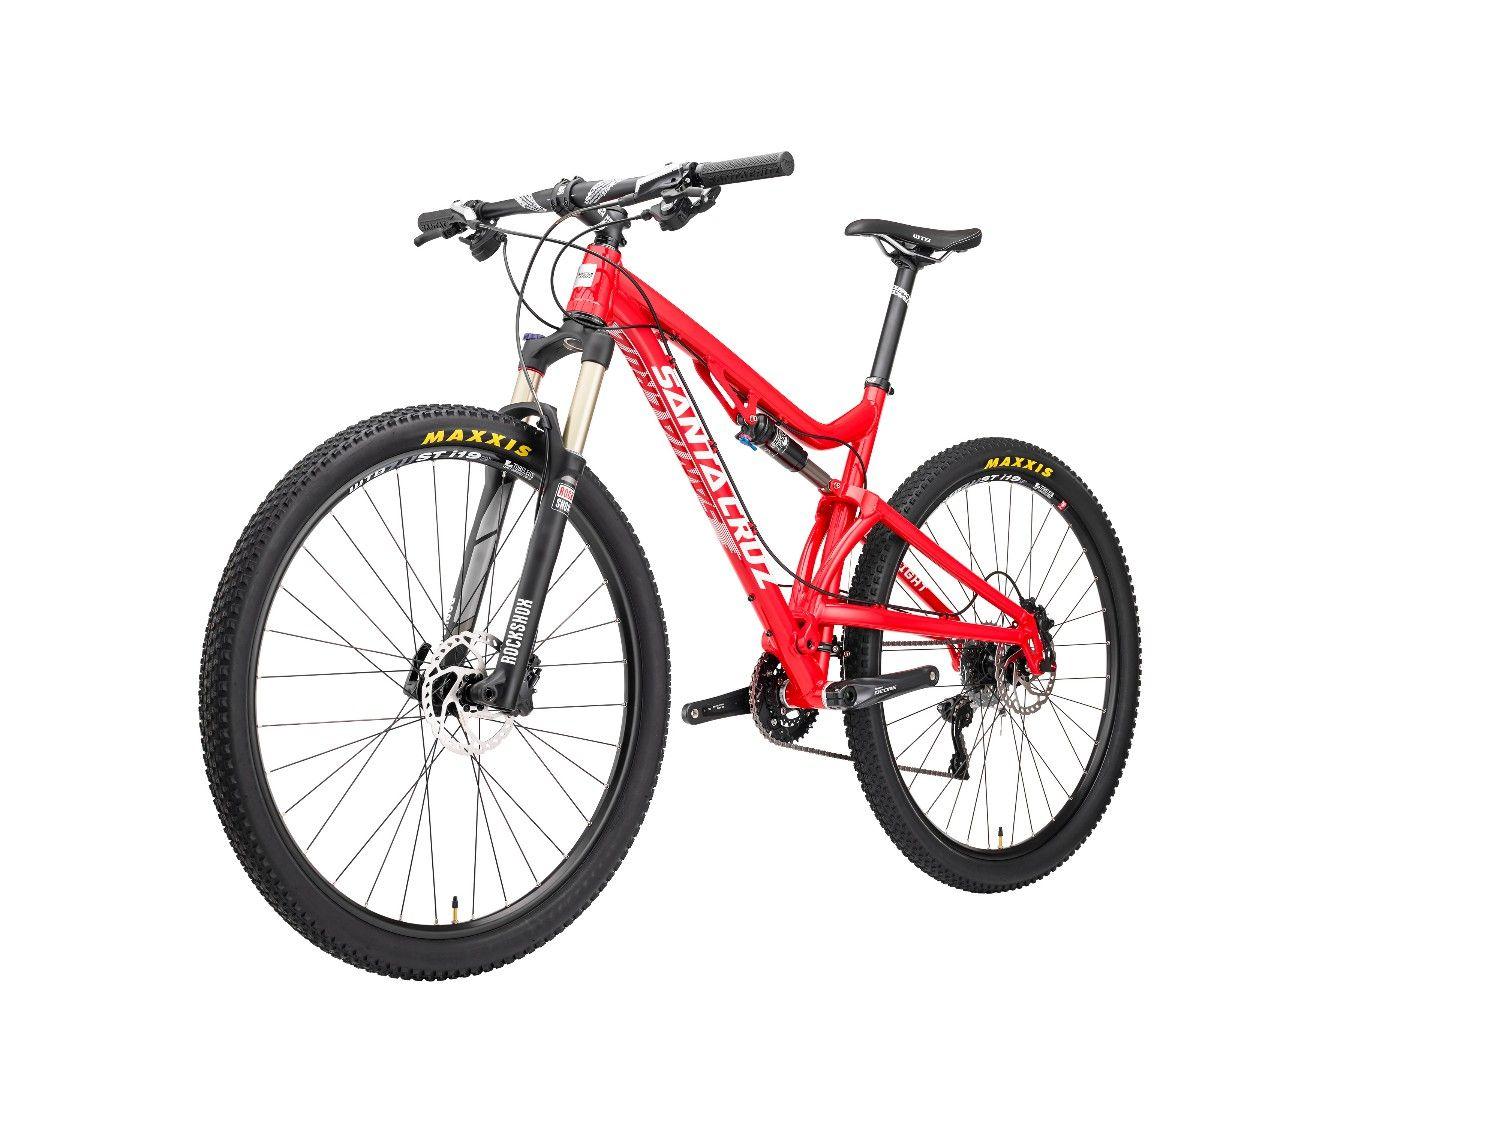 Santa Cruz Superlight | Road and Mountain Biking | Pinterest